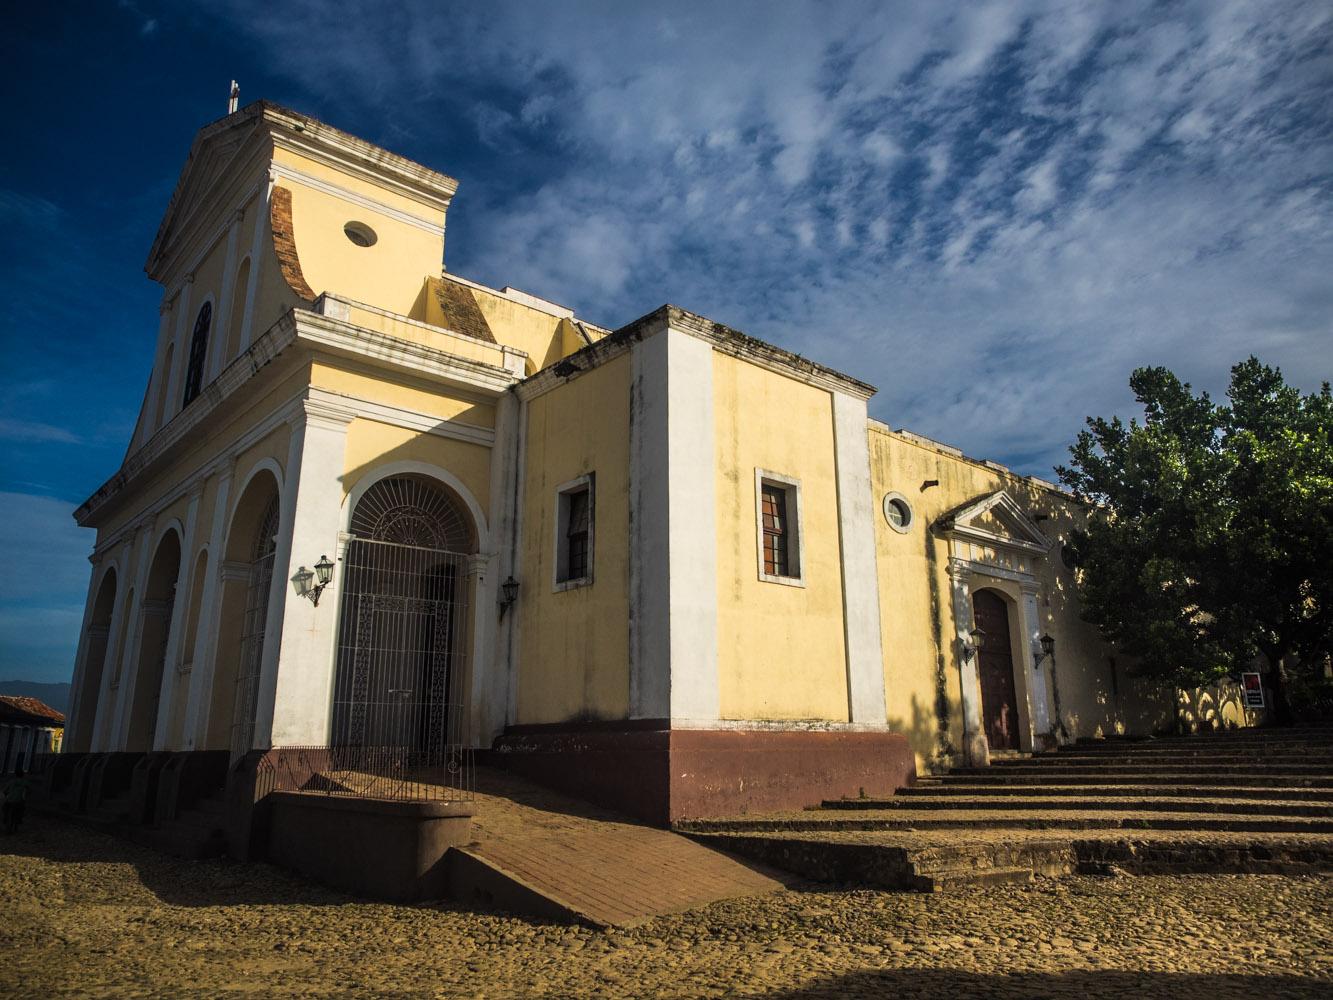 The Holy Trinity Church in the heart of Trinidad.